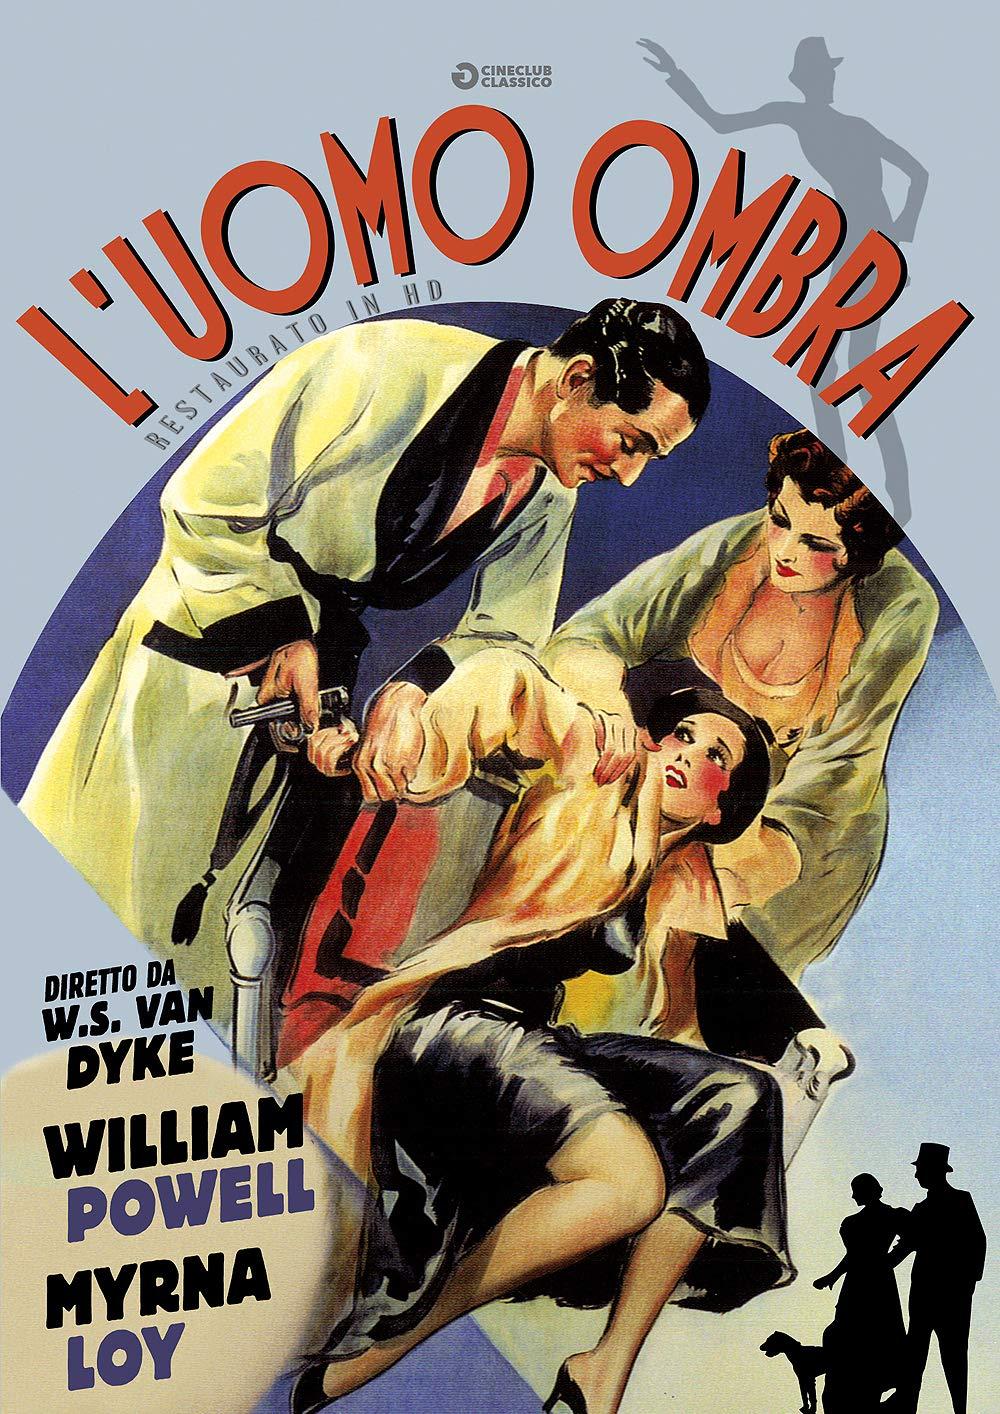 L'UOMO OMBRA (RESTAURATO IN HD) (DVD)